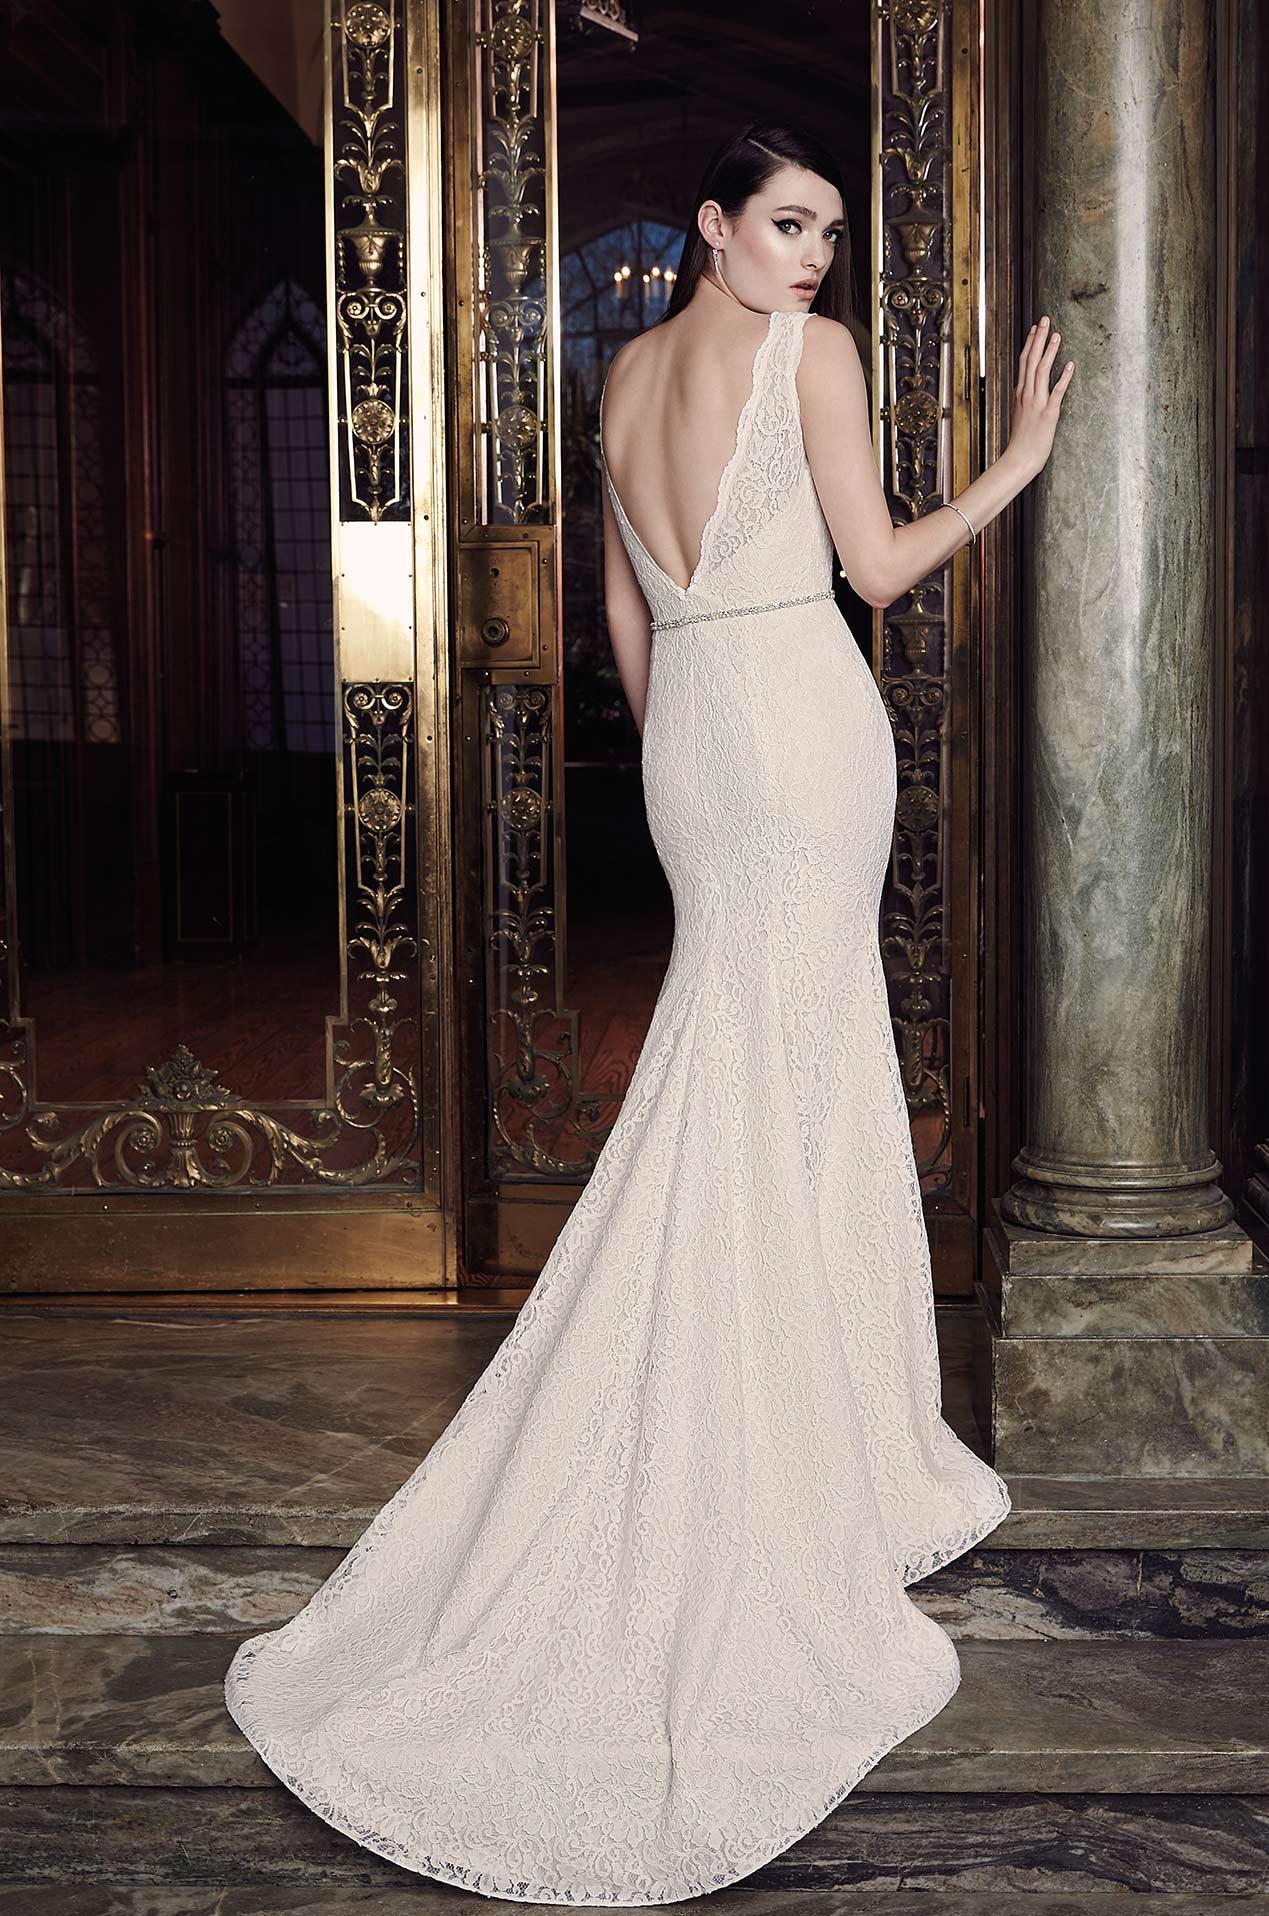 Lace Wedding Dress Style 2016 Mikaella Bridal